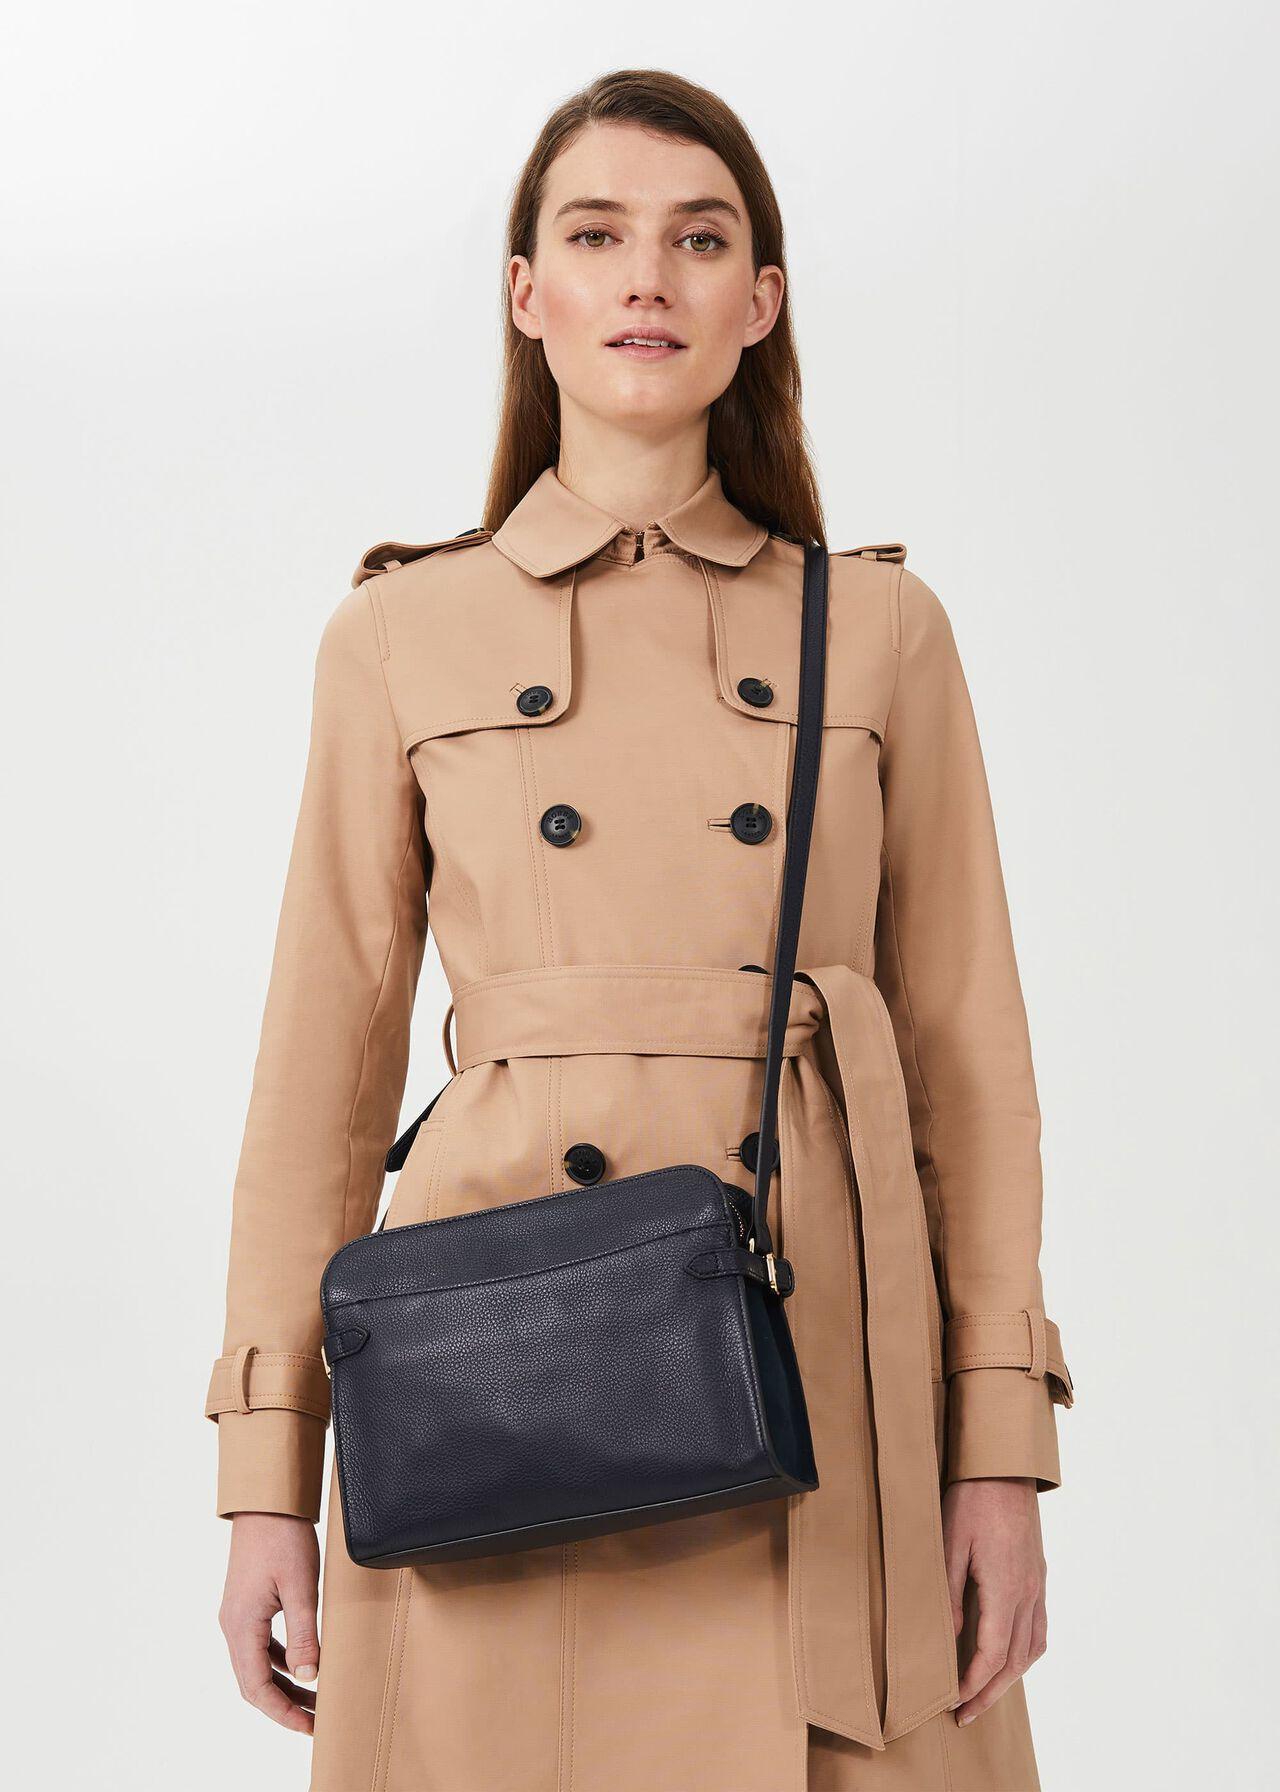 Kimberwick Leather Cross Body Bag, Navy, hi-res